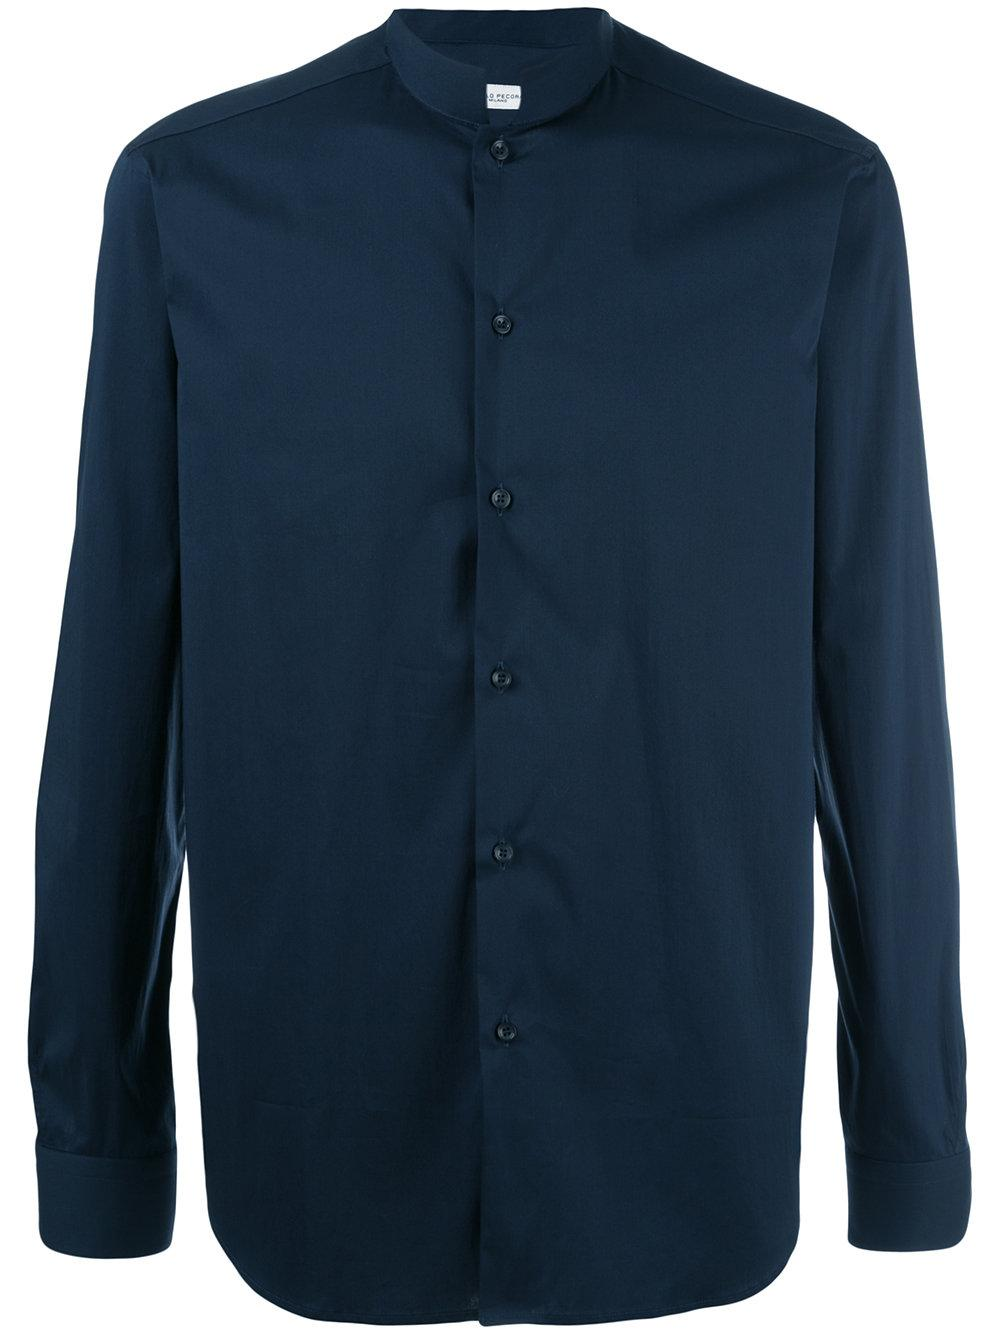 Paolo Pecora Mandarin Collar Shirt In Blue For Men Lyst